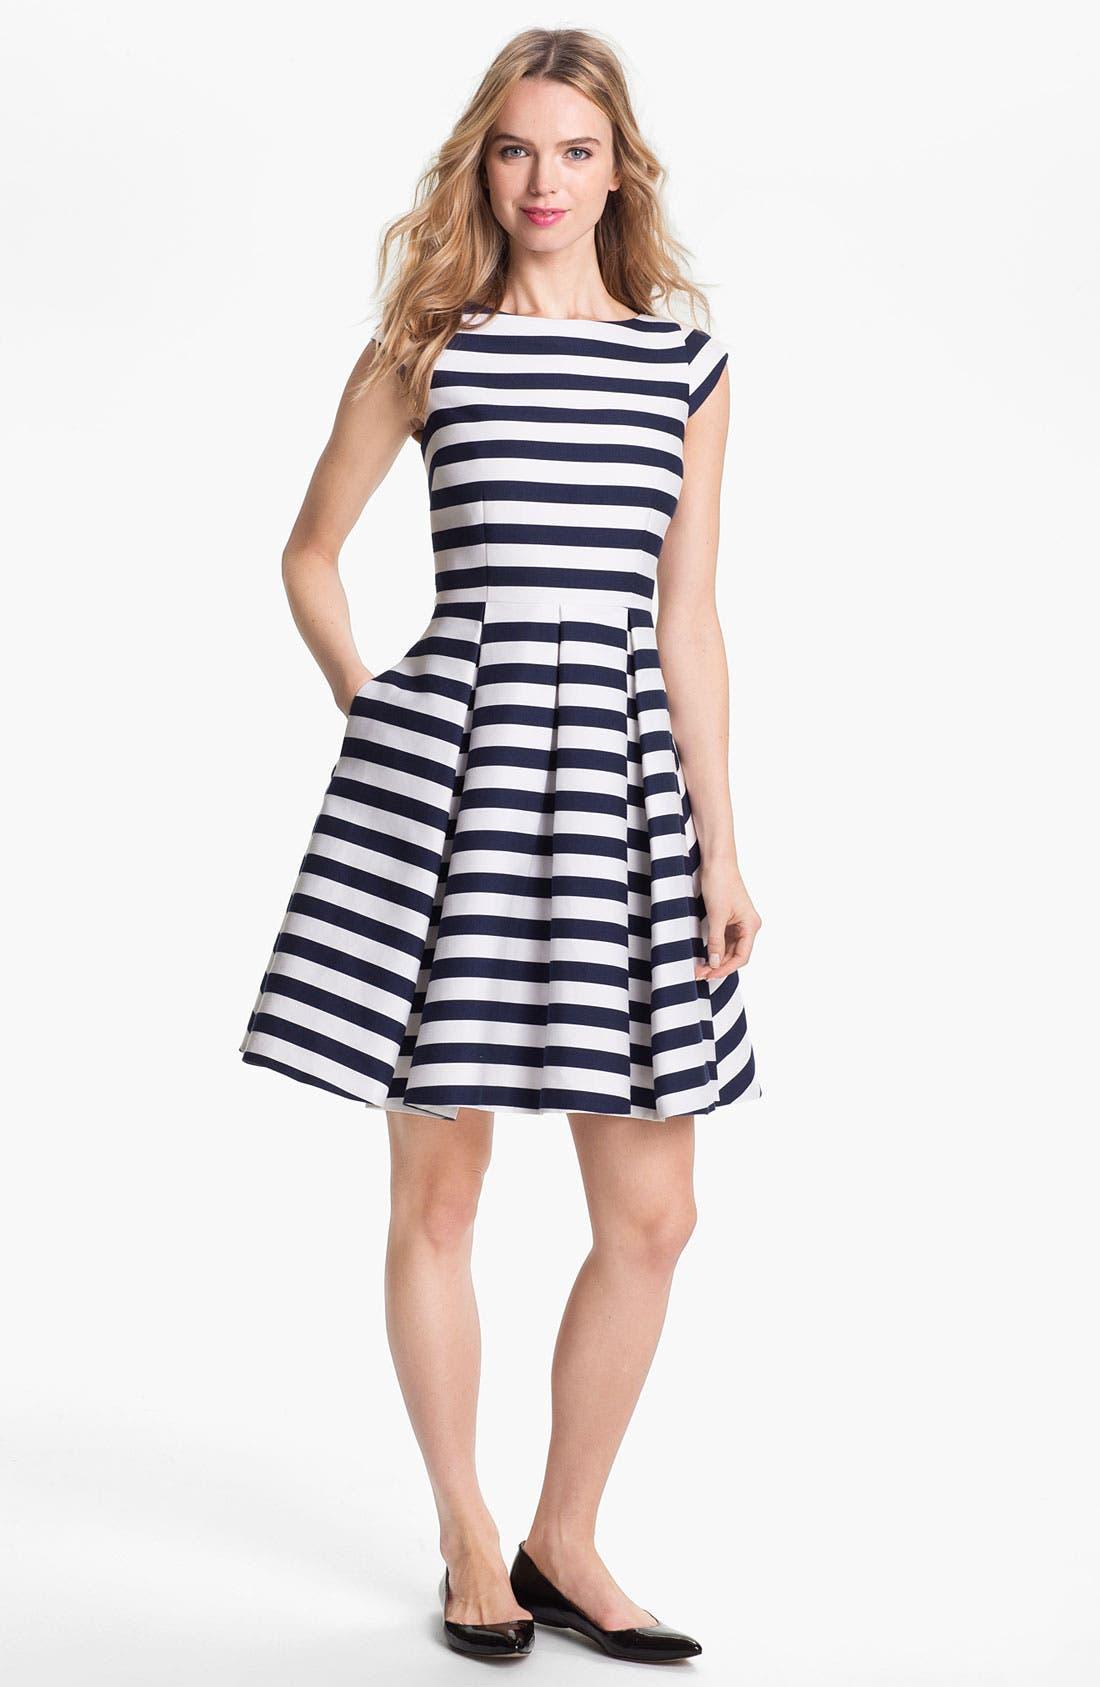 Main Image - kate spade new york 'mariella' cotton blend fit & flare dress